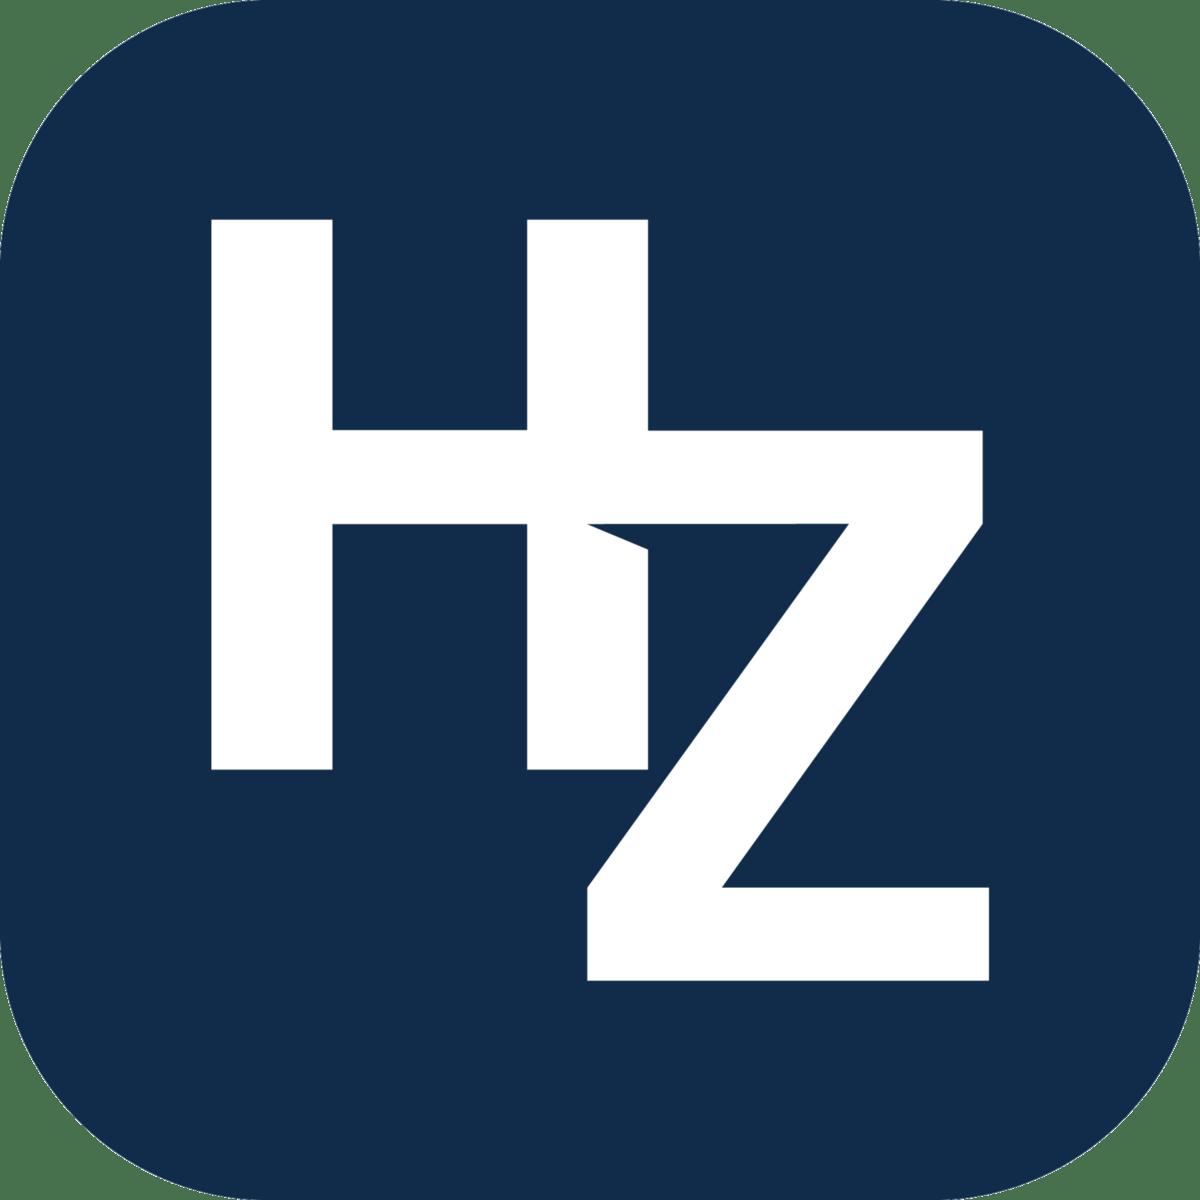 hz logo